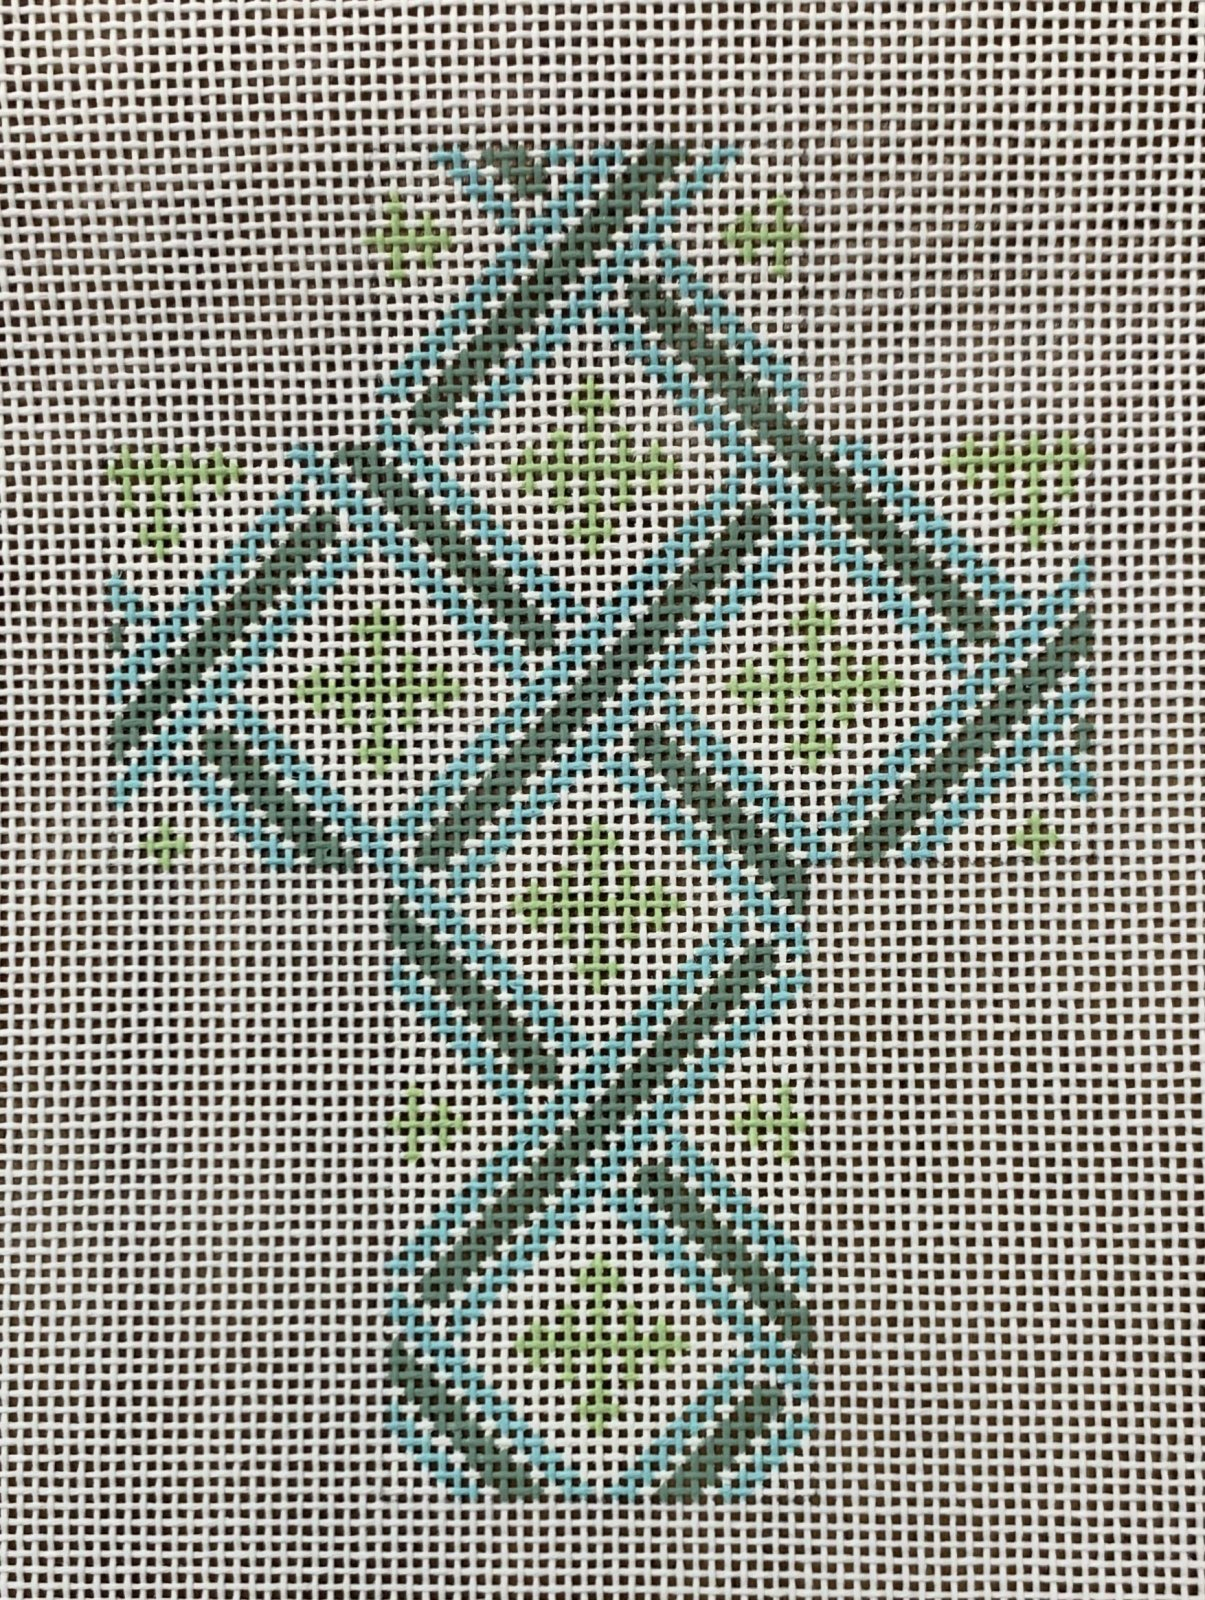 Green and Aqua Cross